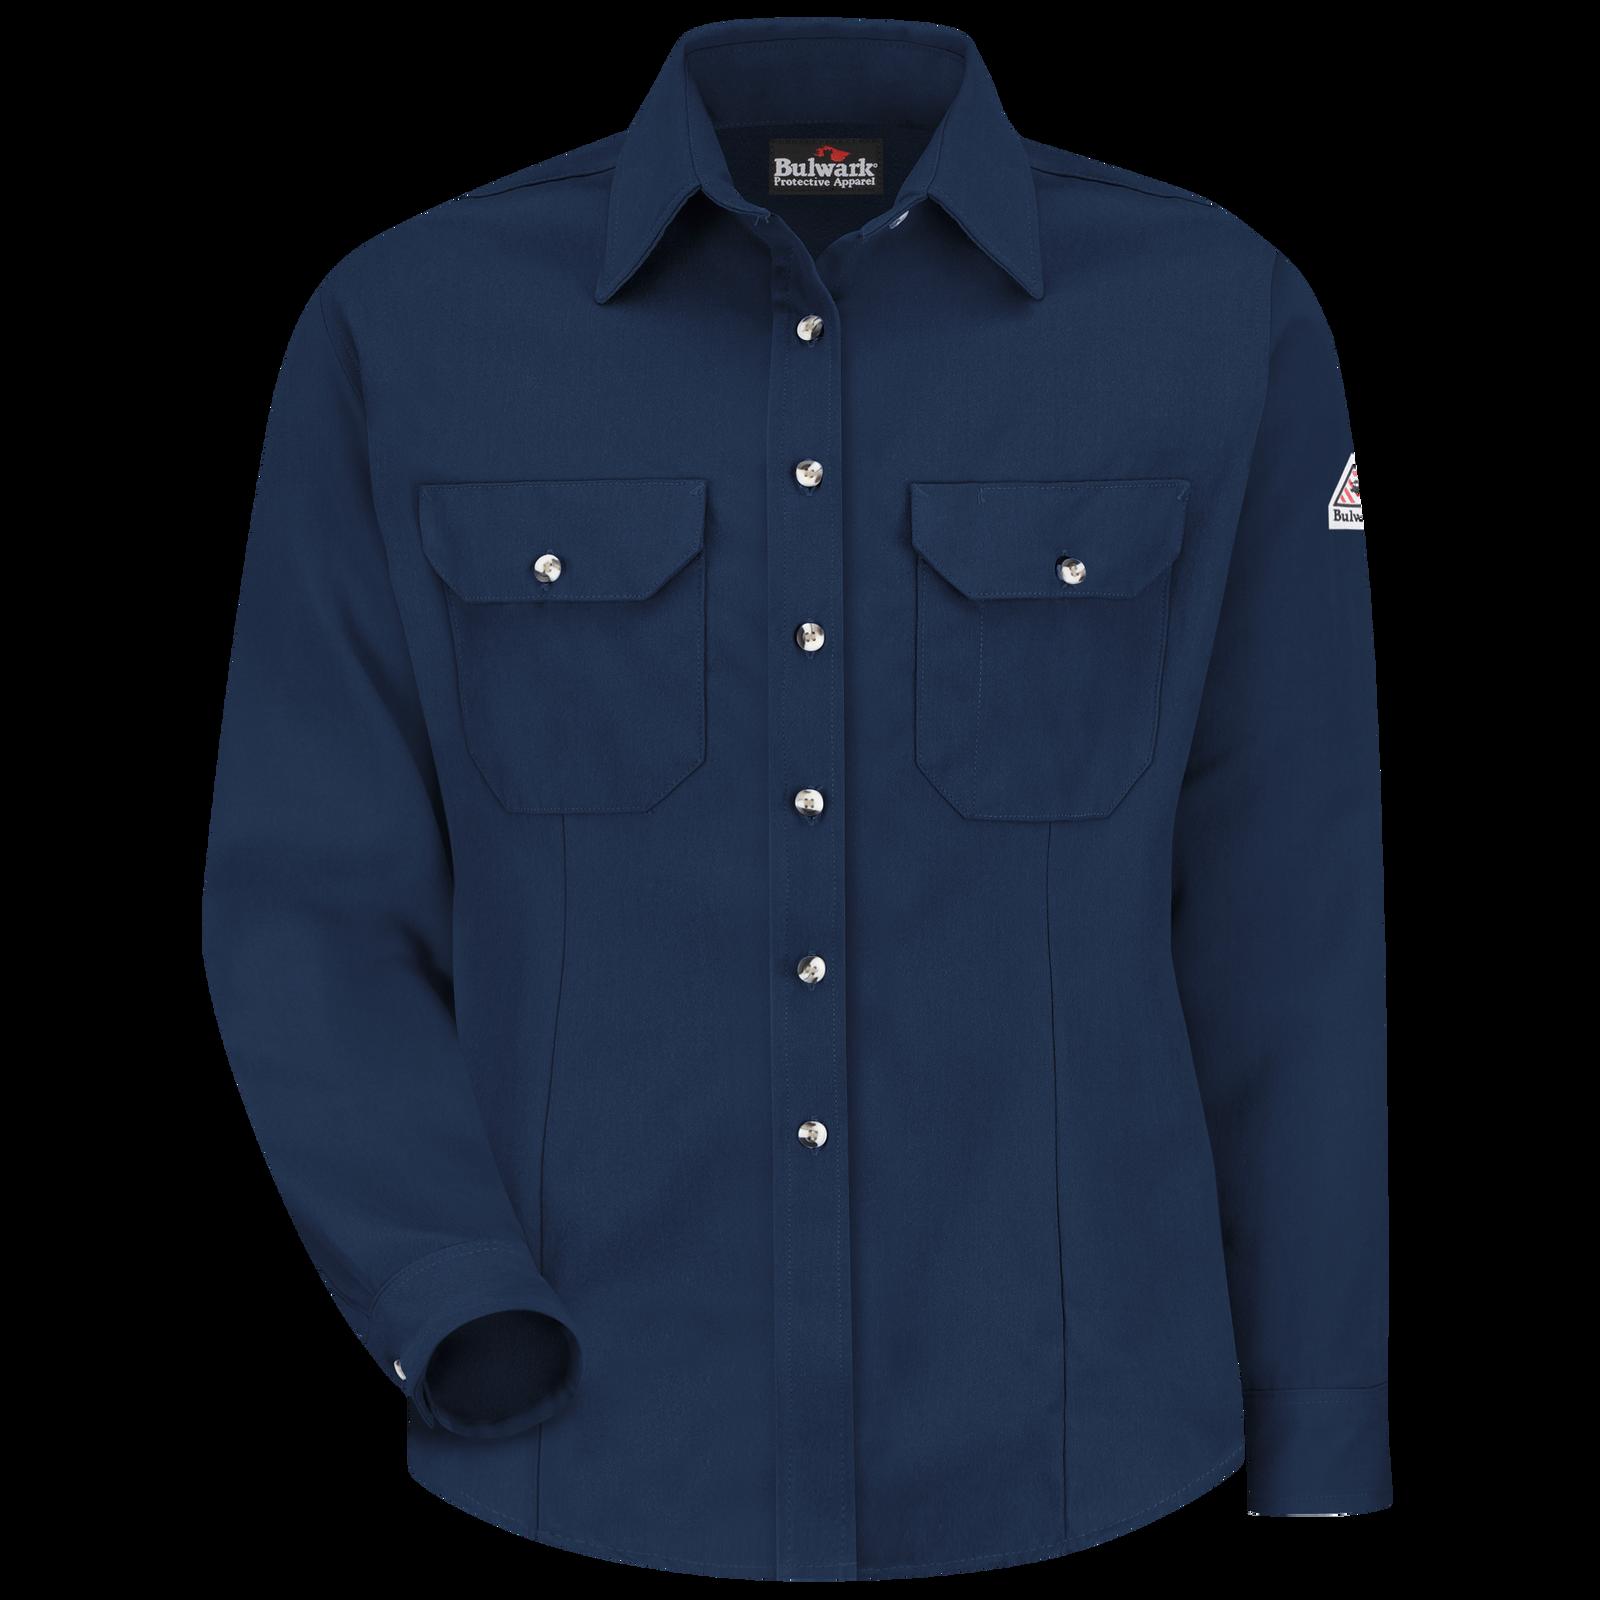 NWT Bulwark FR 2112 Women/'s Medium Button Up Shirt Blue IQ Series Qs31lb